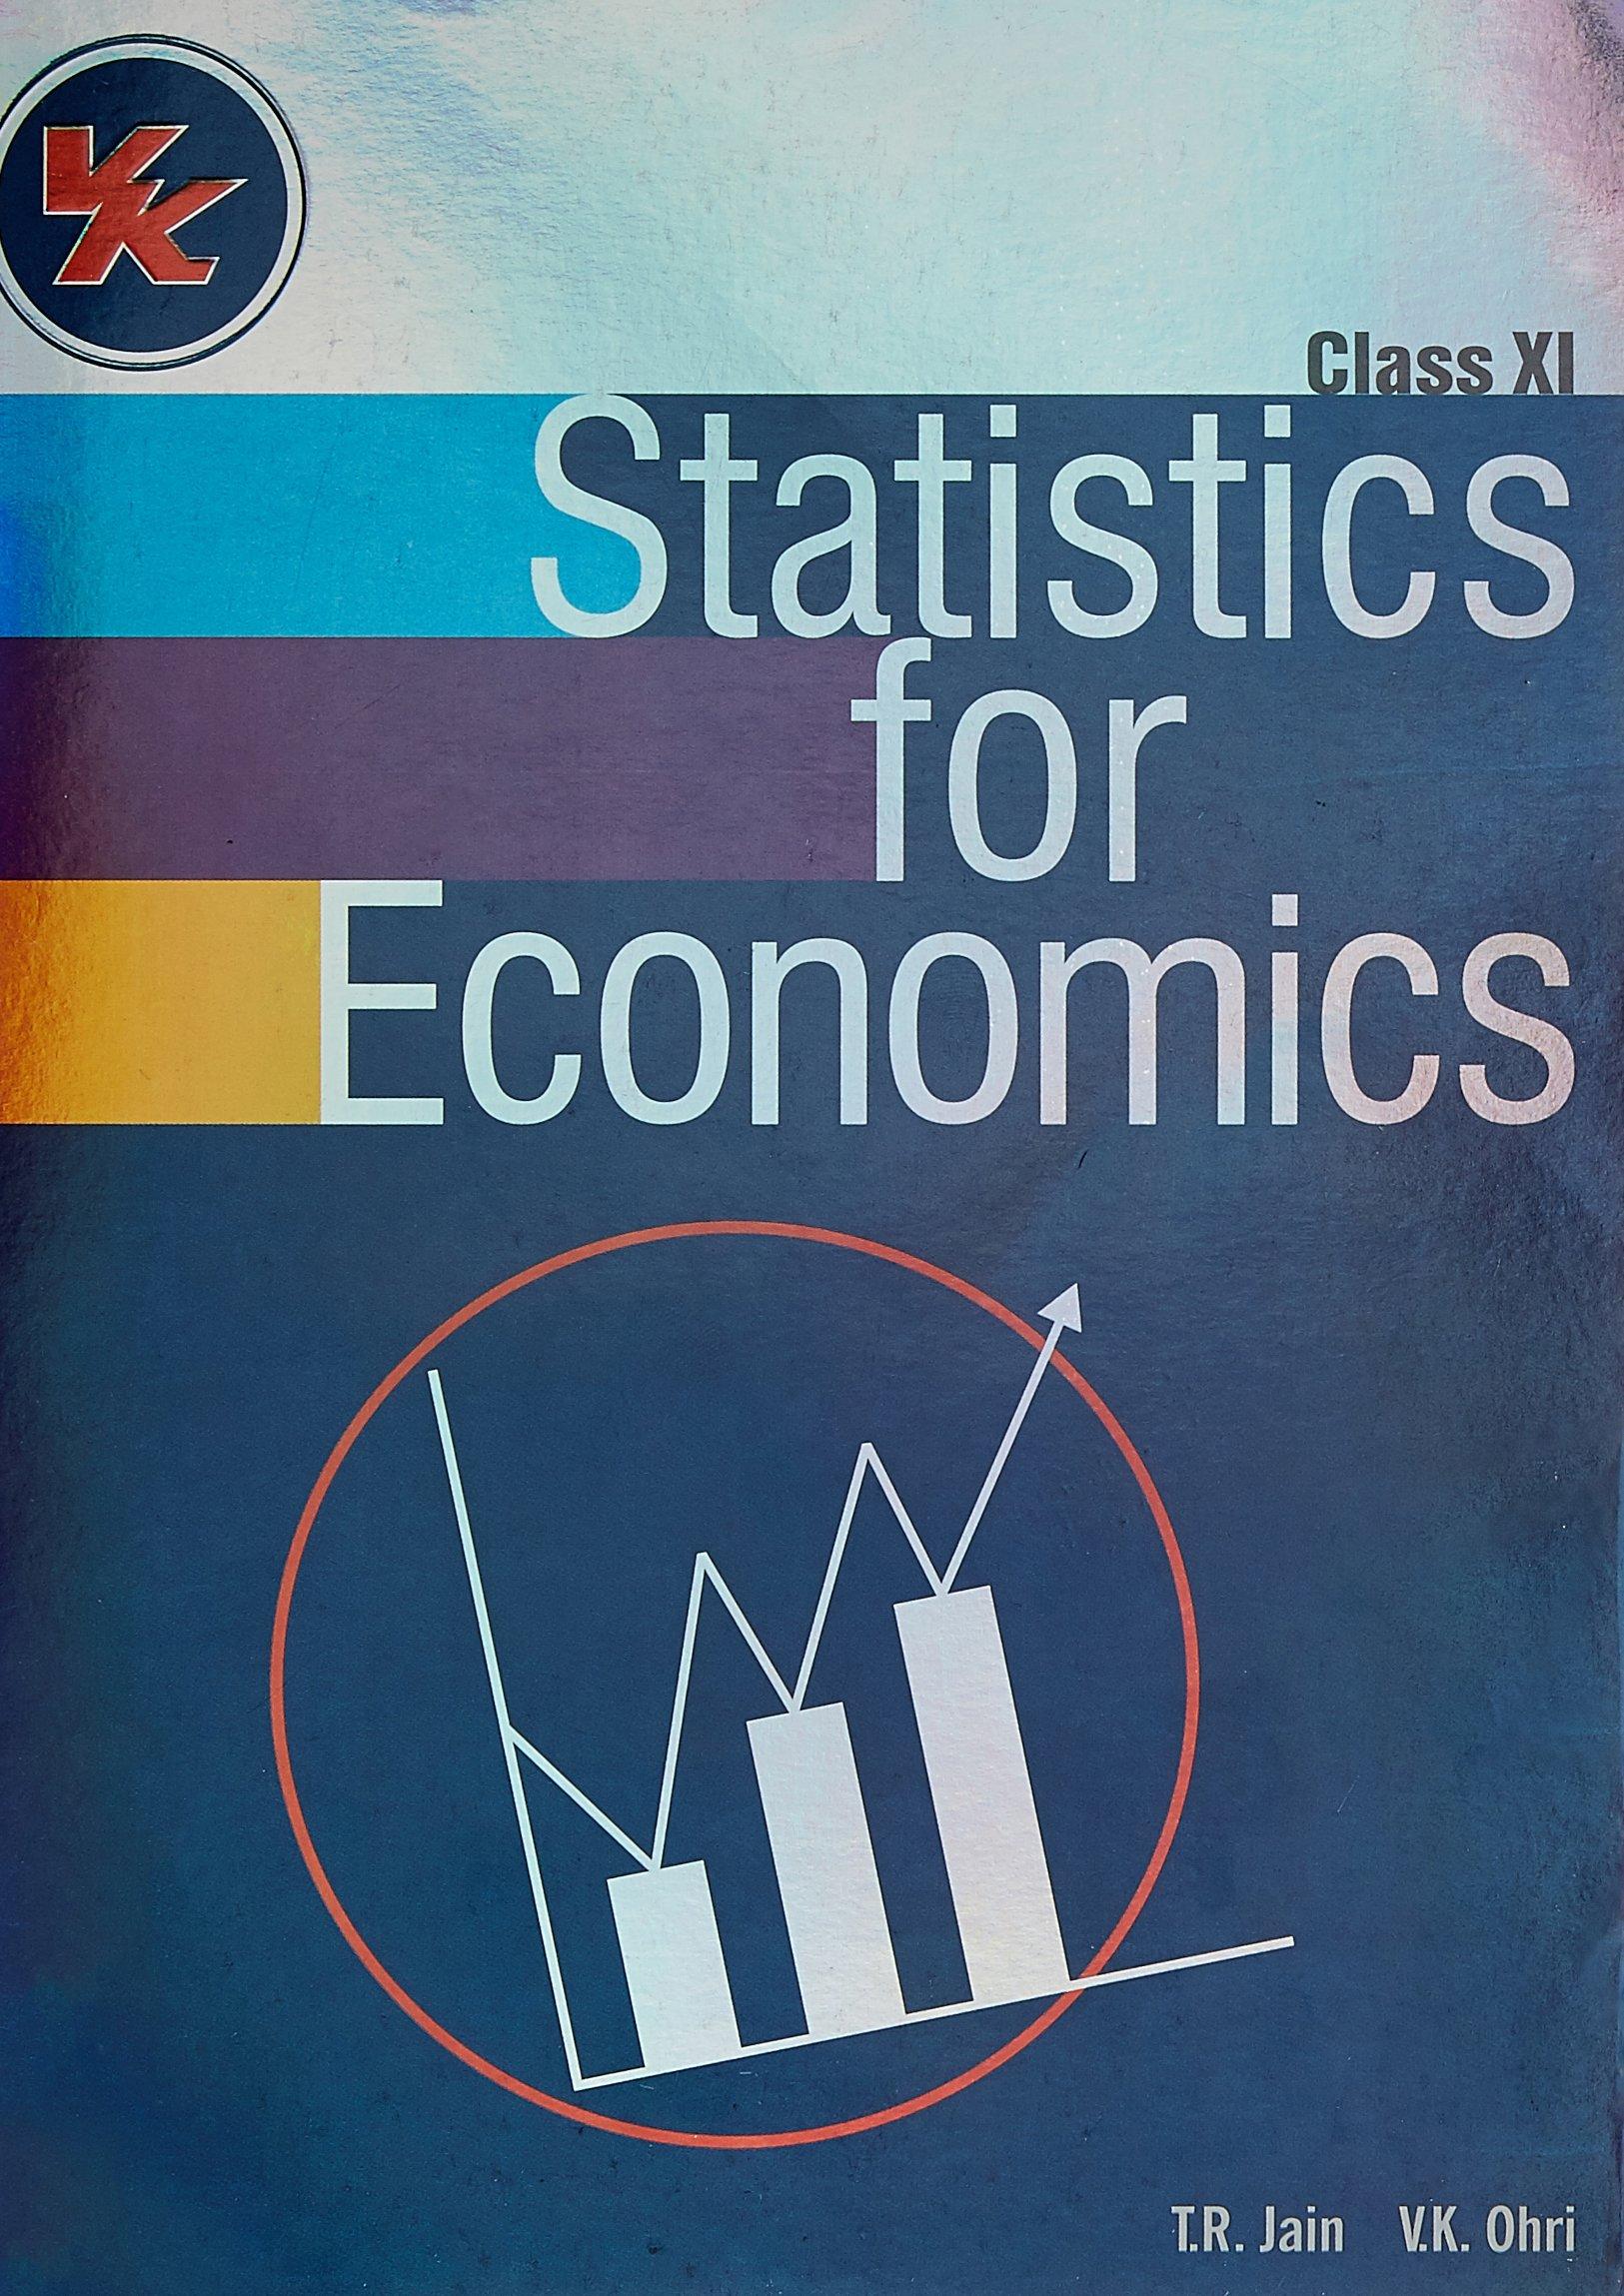 Statistics for economics class xi amazon tr jain vk ohri statistics for economics class xi amazon tr jain vk ohri books fandeluxe Image collections